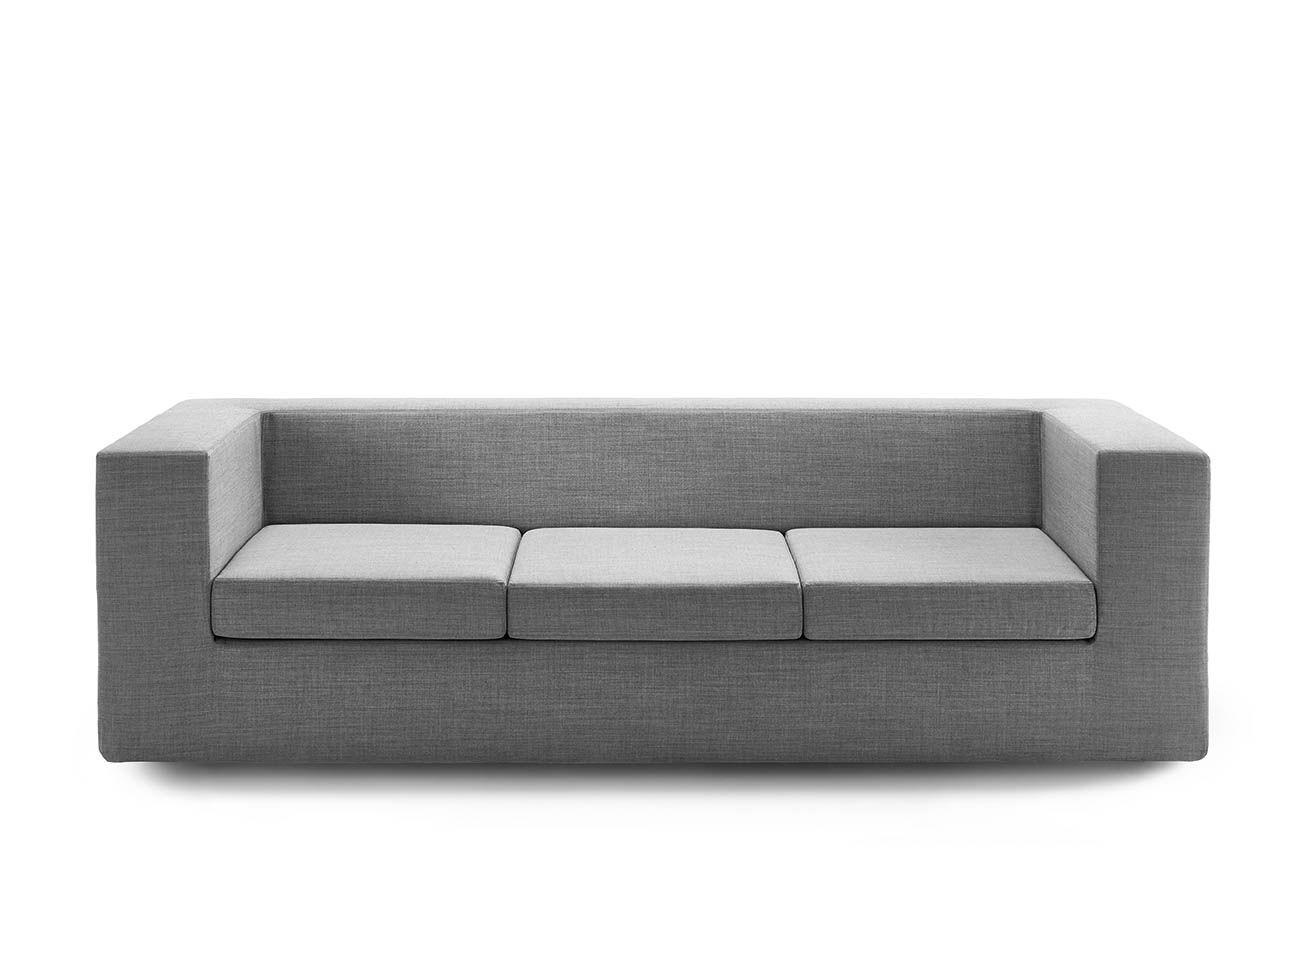 Throw Away L Sofa By Zanotta Design Willie Landels